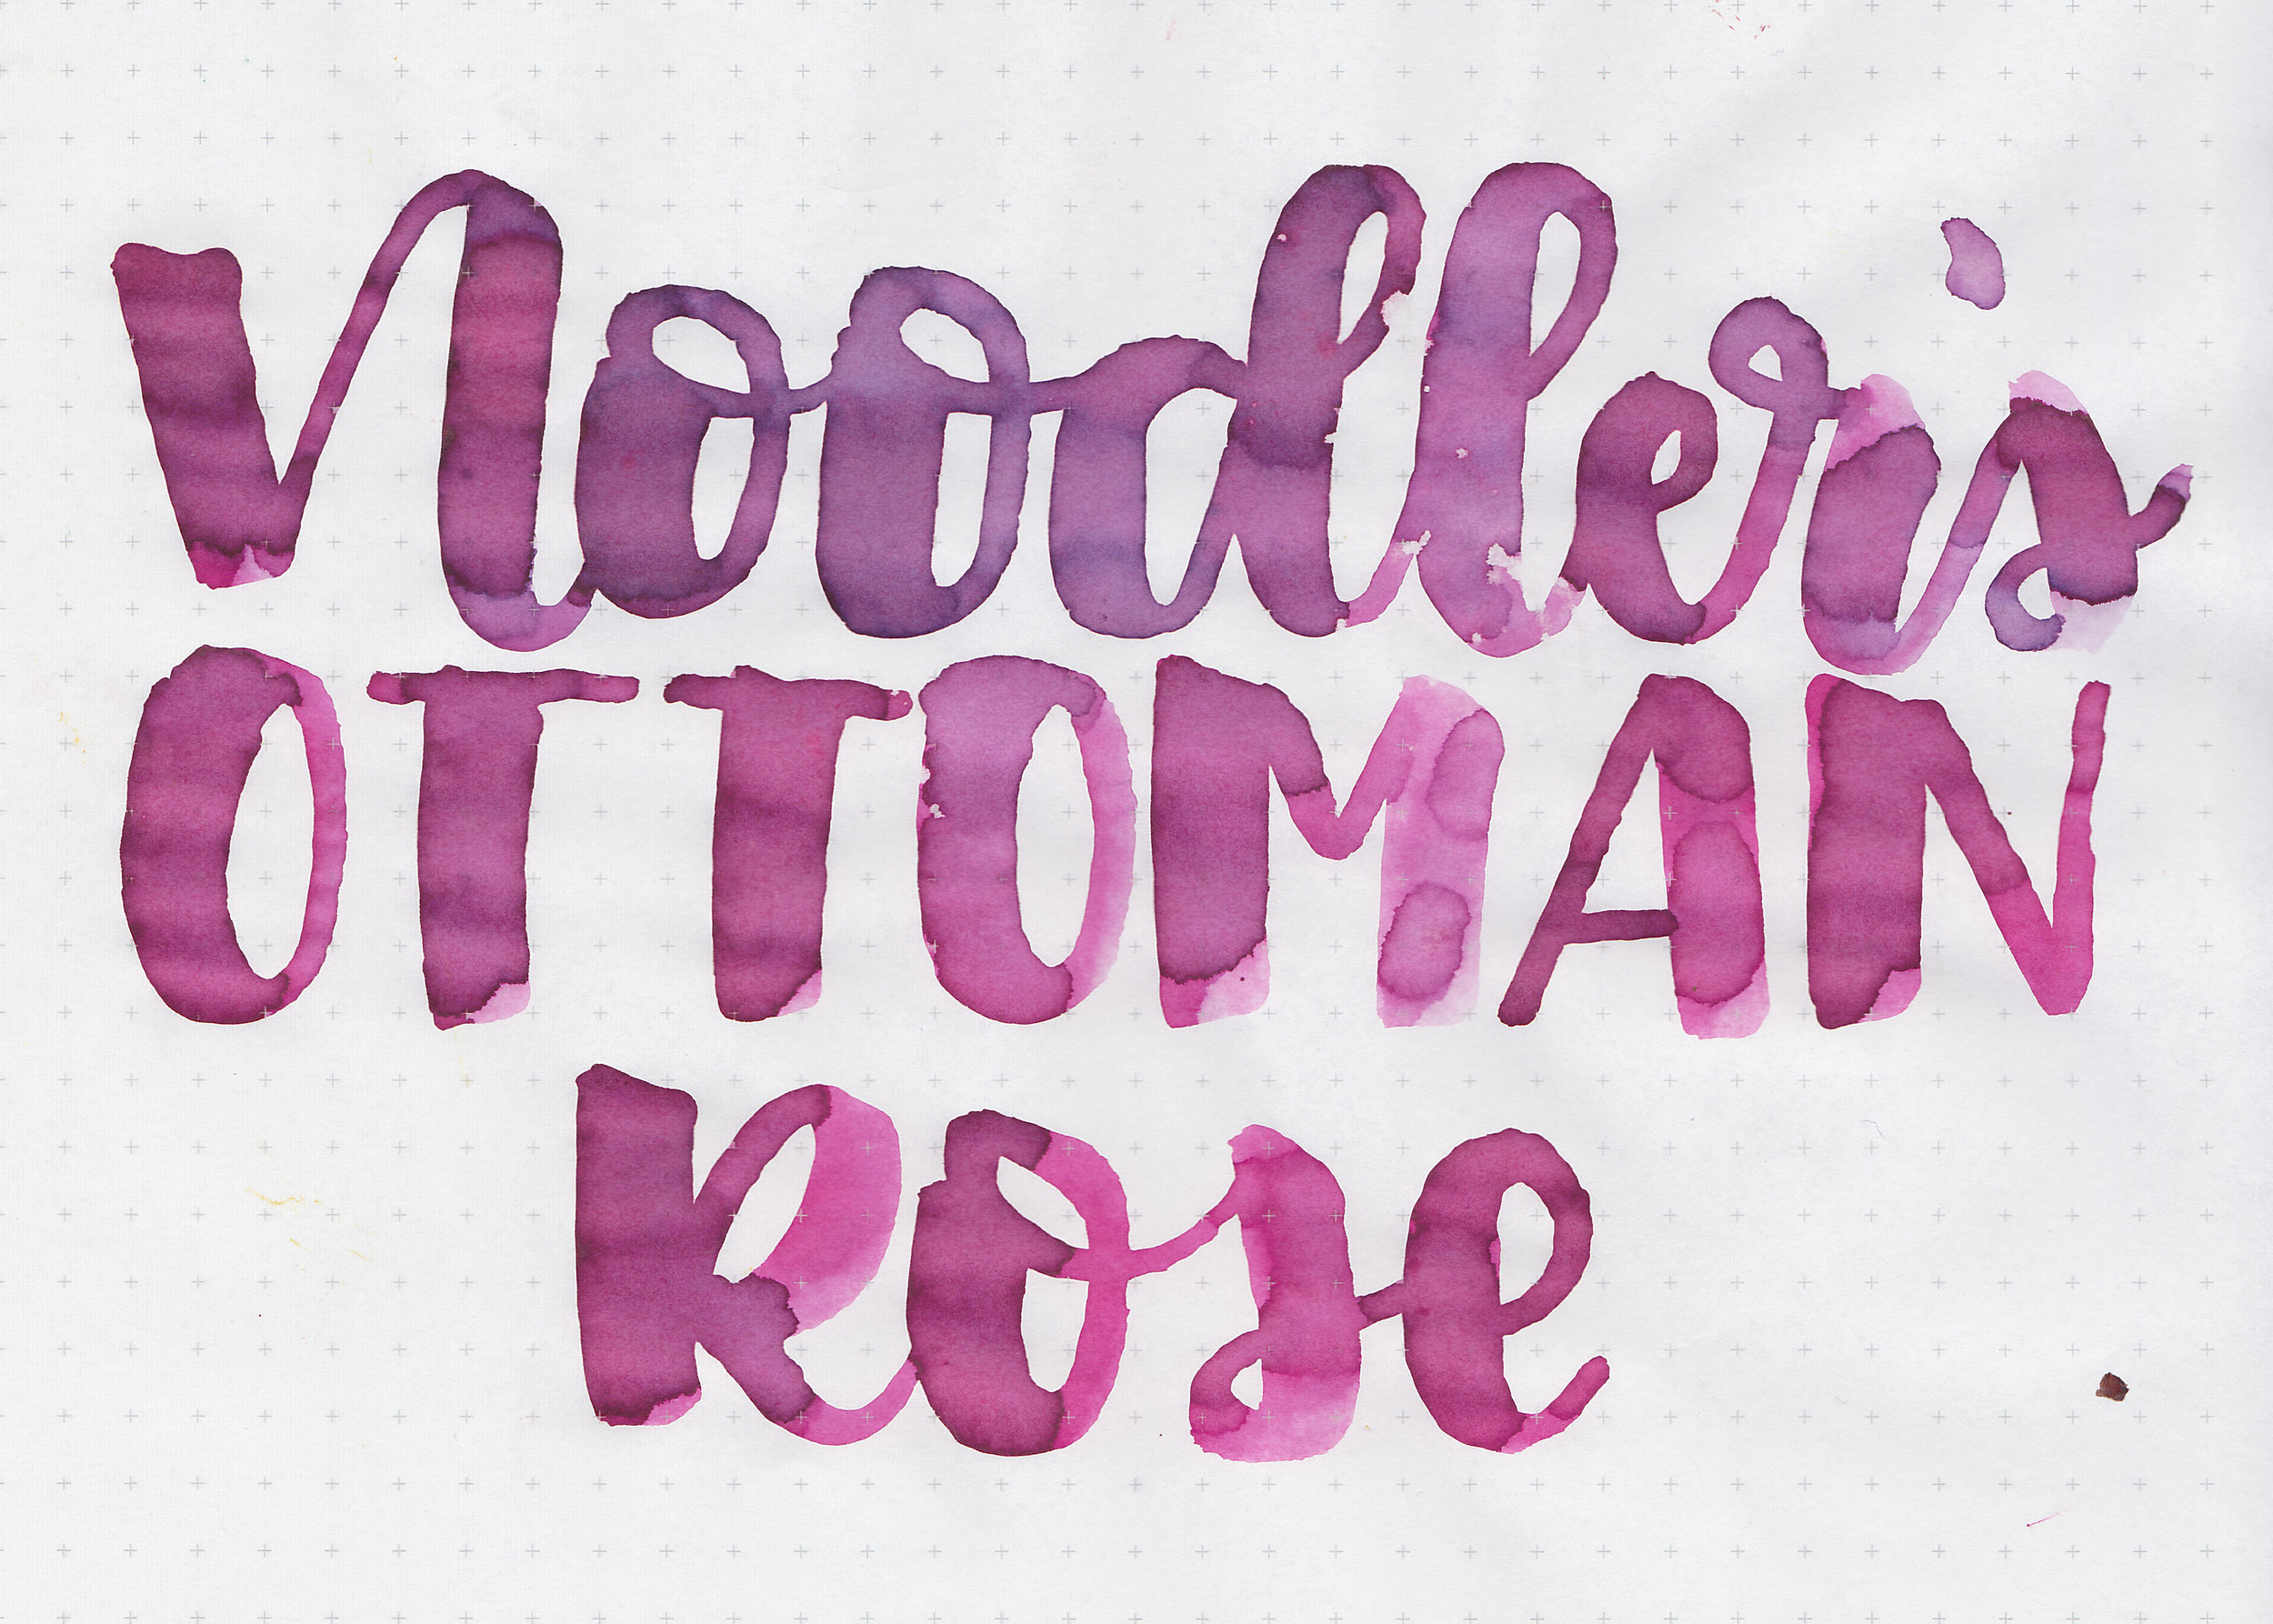 nood-ottoman-rose-4.jpg